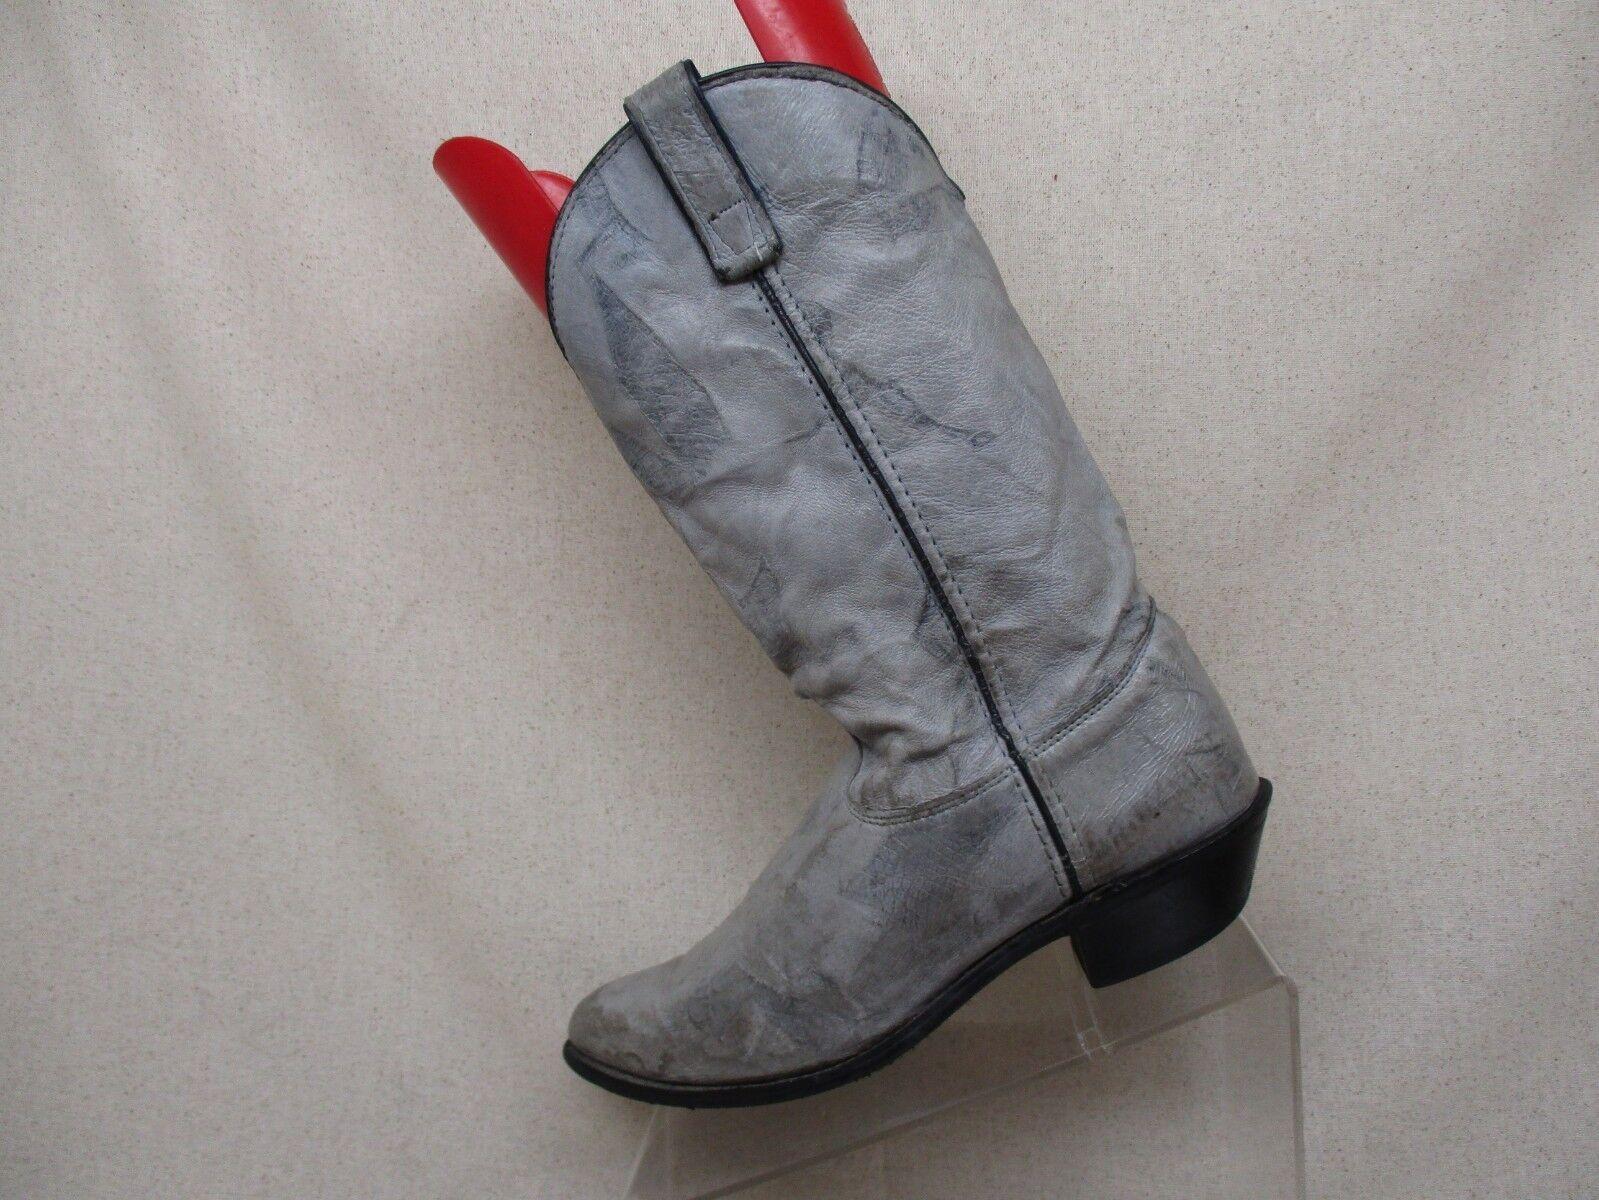 CAPEZIO Gray Leder Cowboy Western Stiefel Stiefel Western Damenschuhe Größe 8.5 M Style L382 USA 4d0288